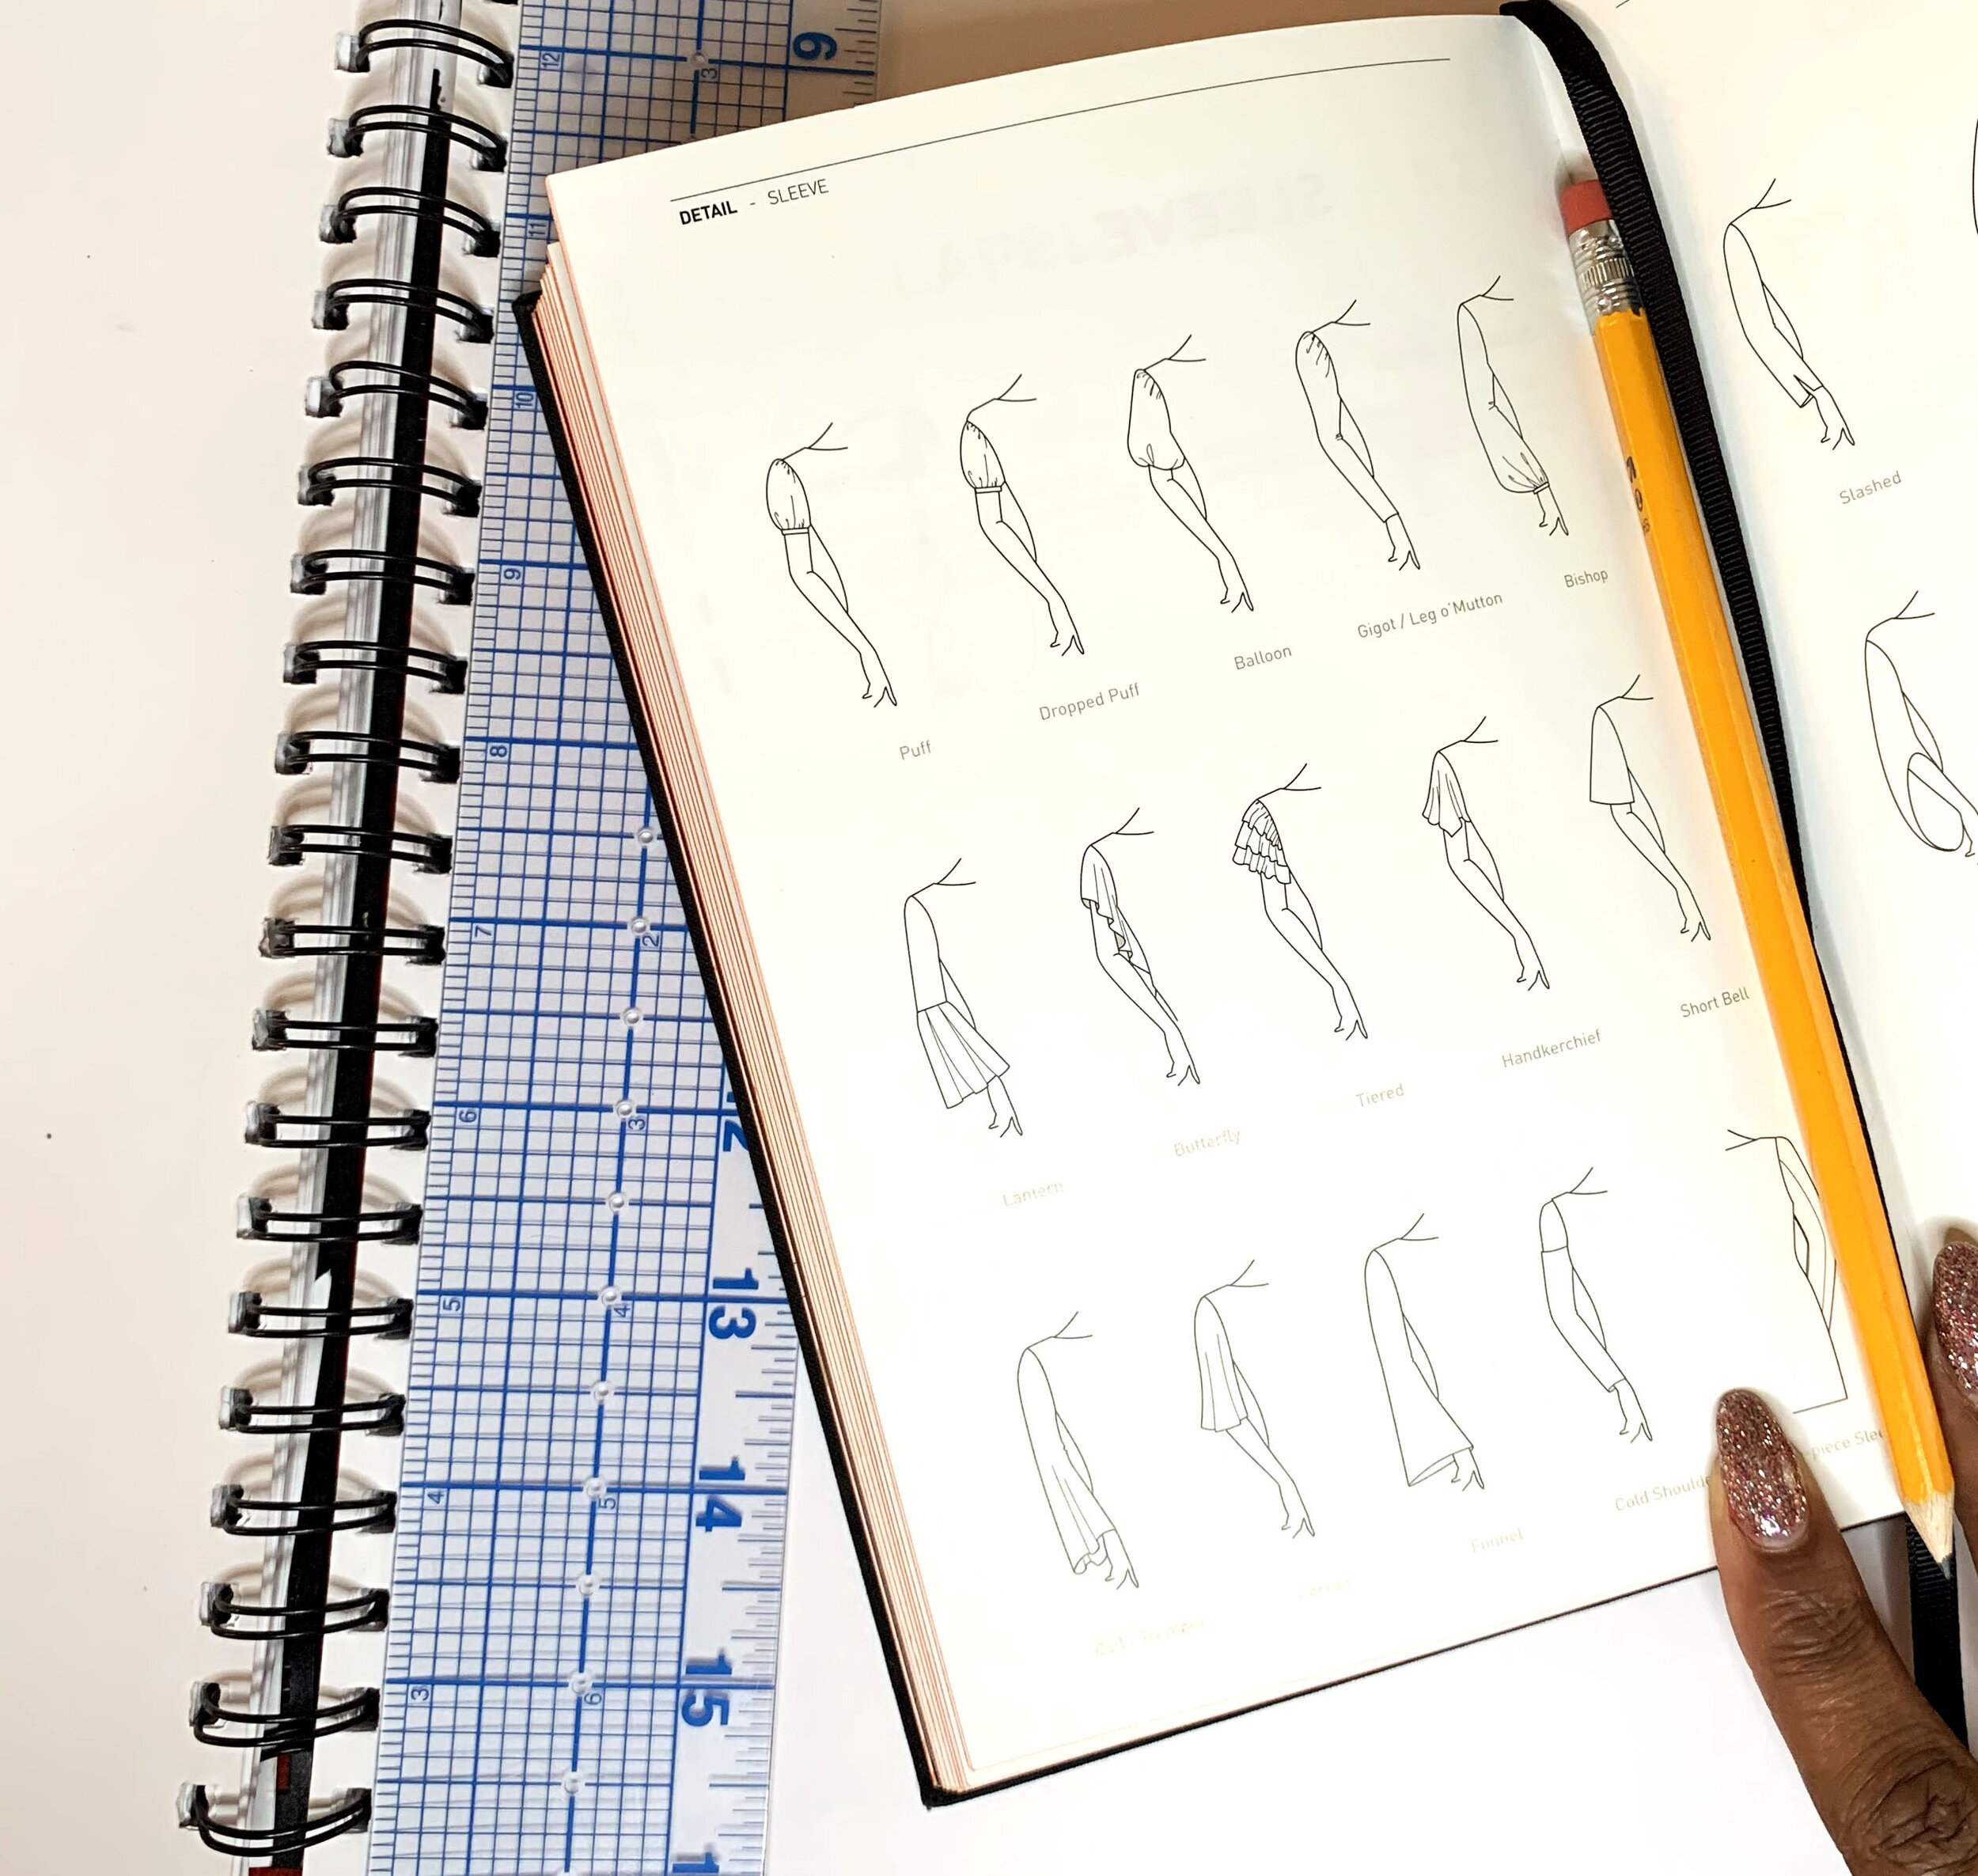 Fashionpedia A Visual Dictionary Of Fashion Design Review Theblackfash